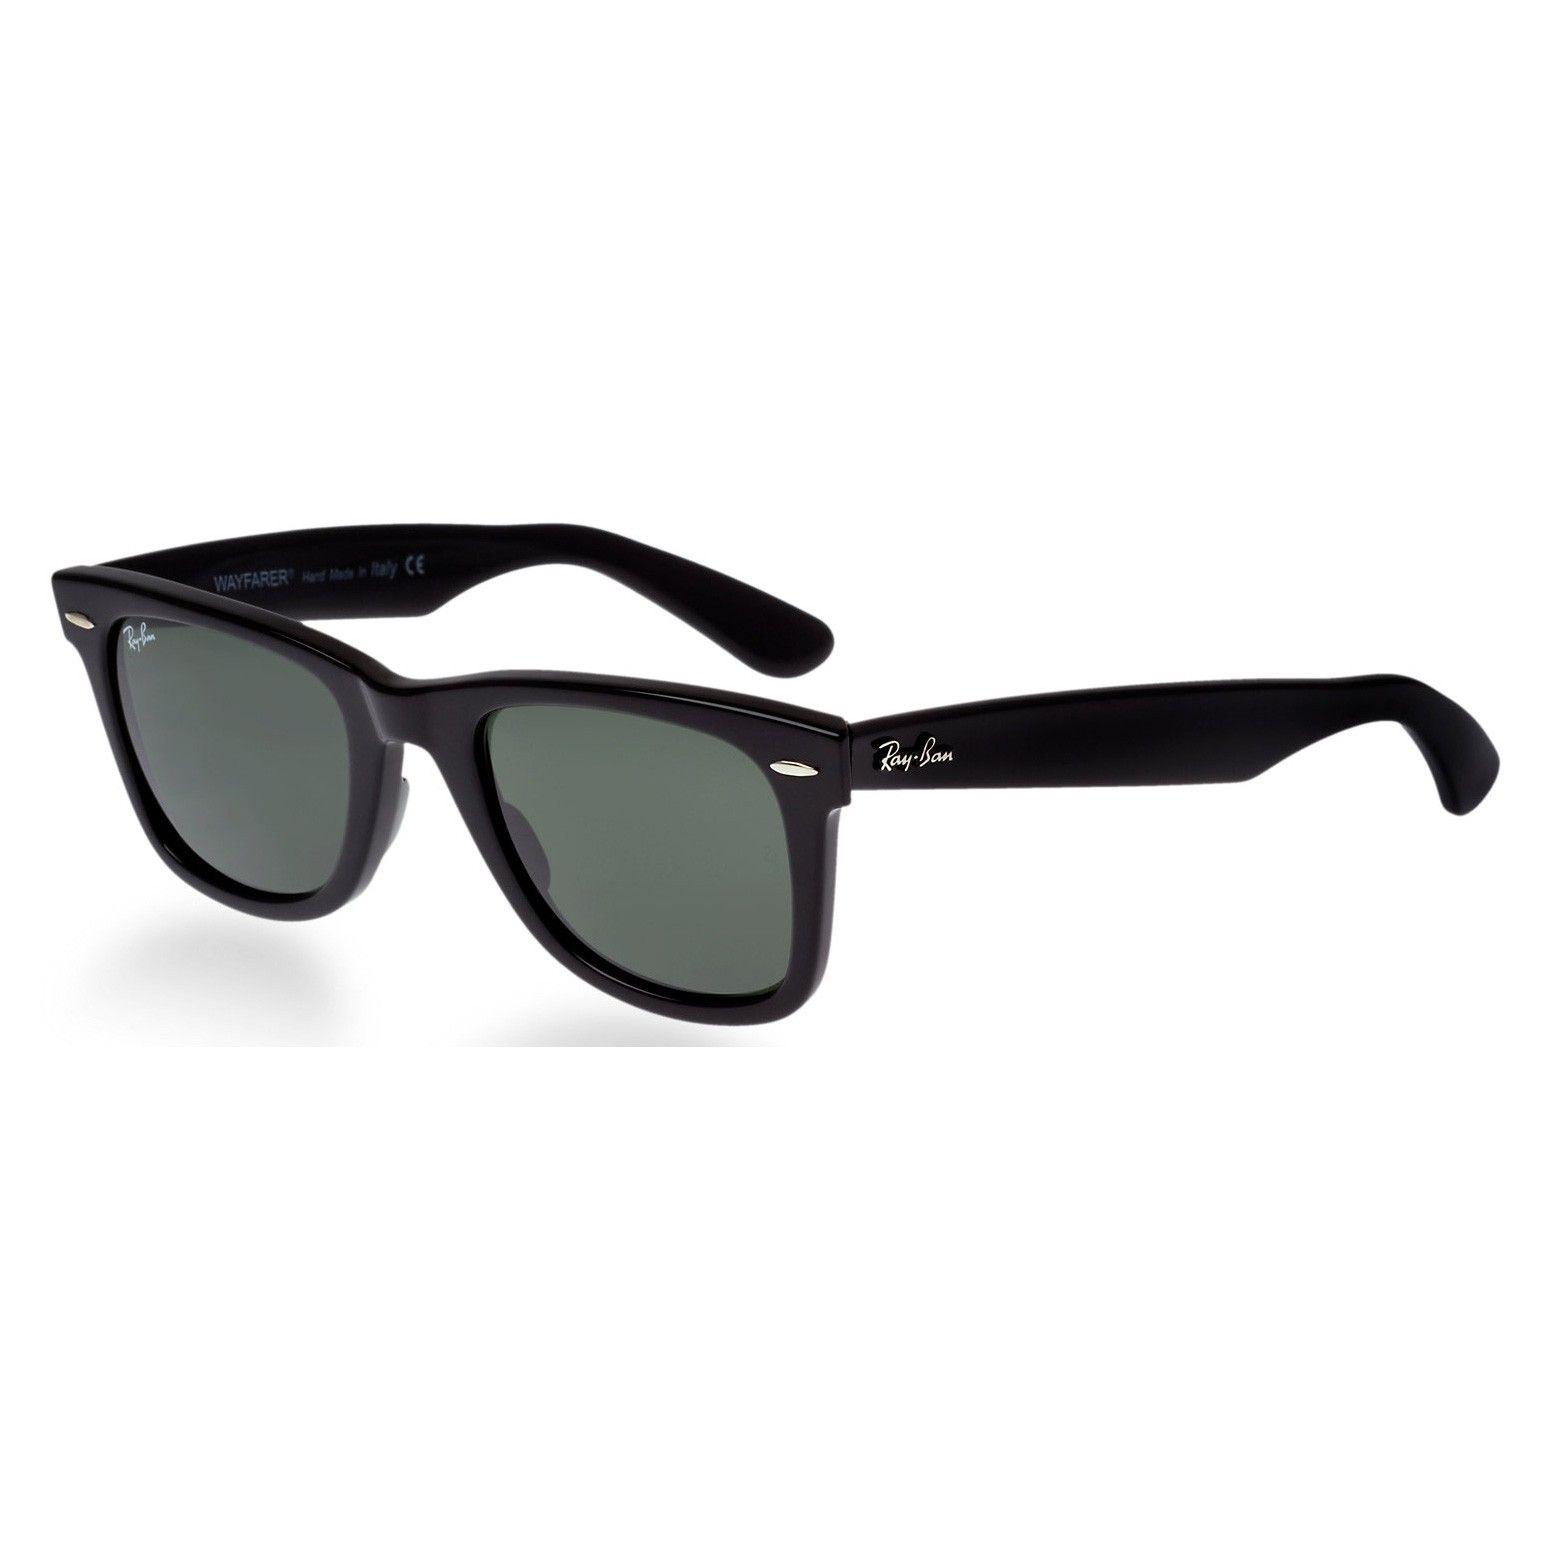 52c8ad4f46 Lentes Ray Ban WAYFARER CLÁSICO RB2140 901 | Cositas | Sunglasses ...